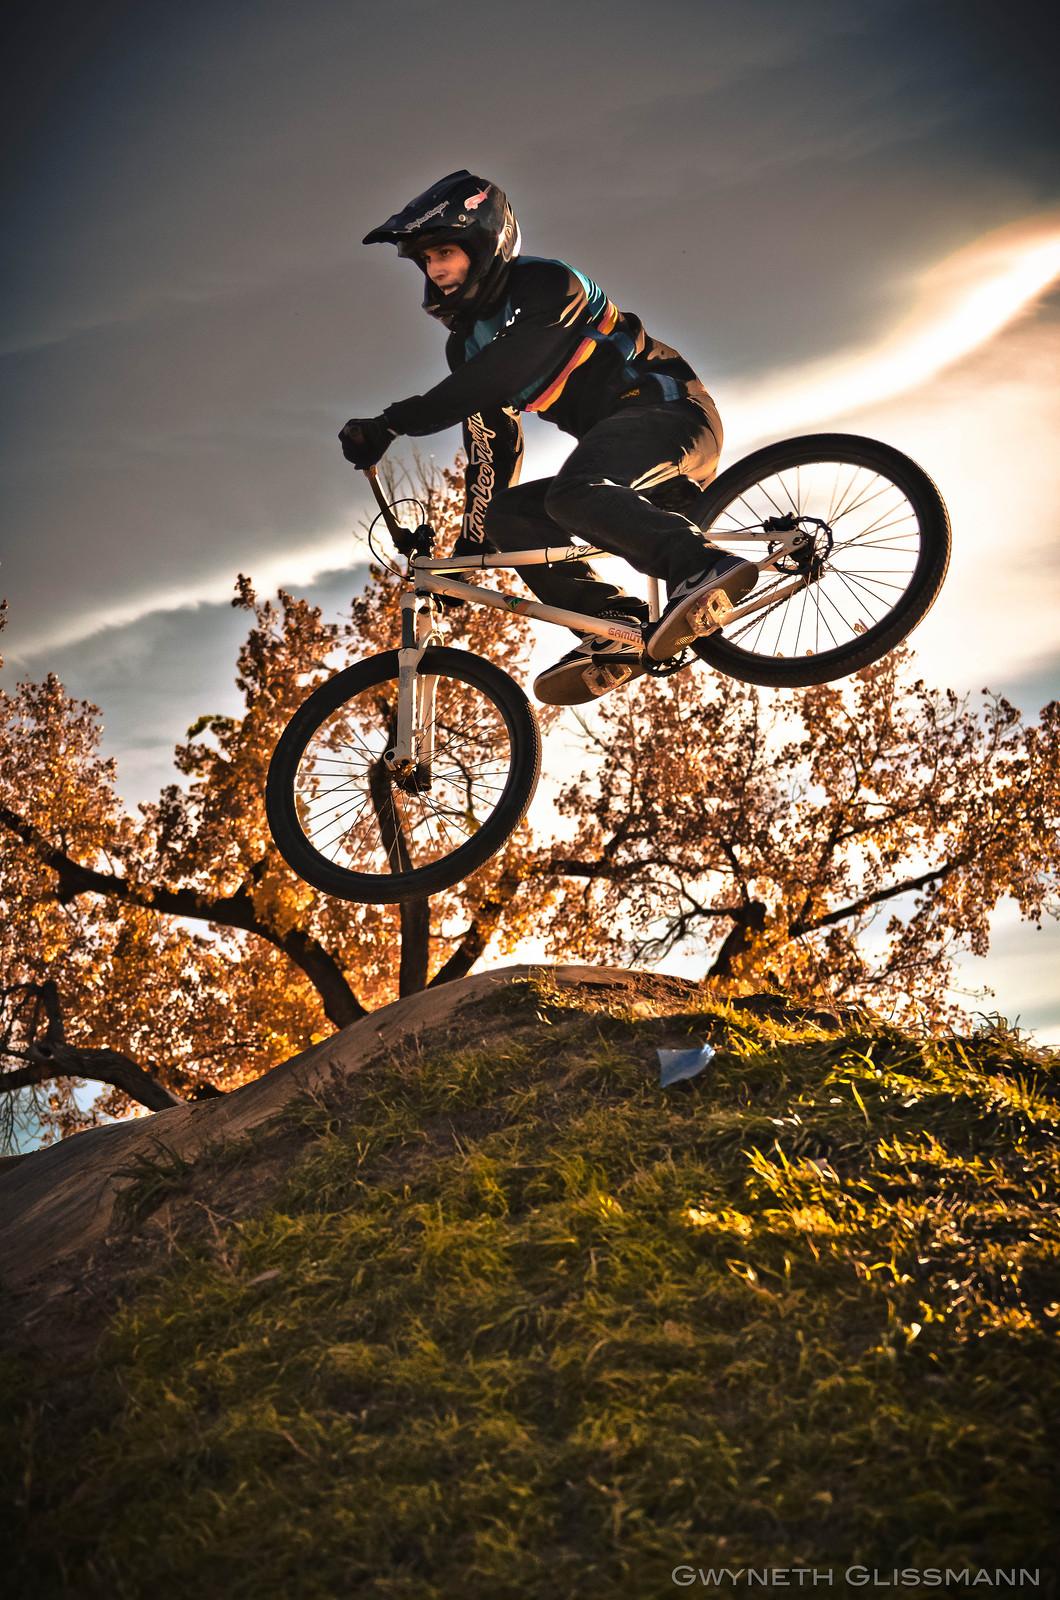 Will Scharninghausen at Valmont Bike Park - rhiannon - Mountain Biking Pictures - Vital MTB